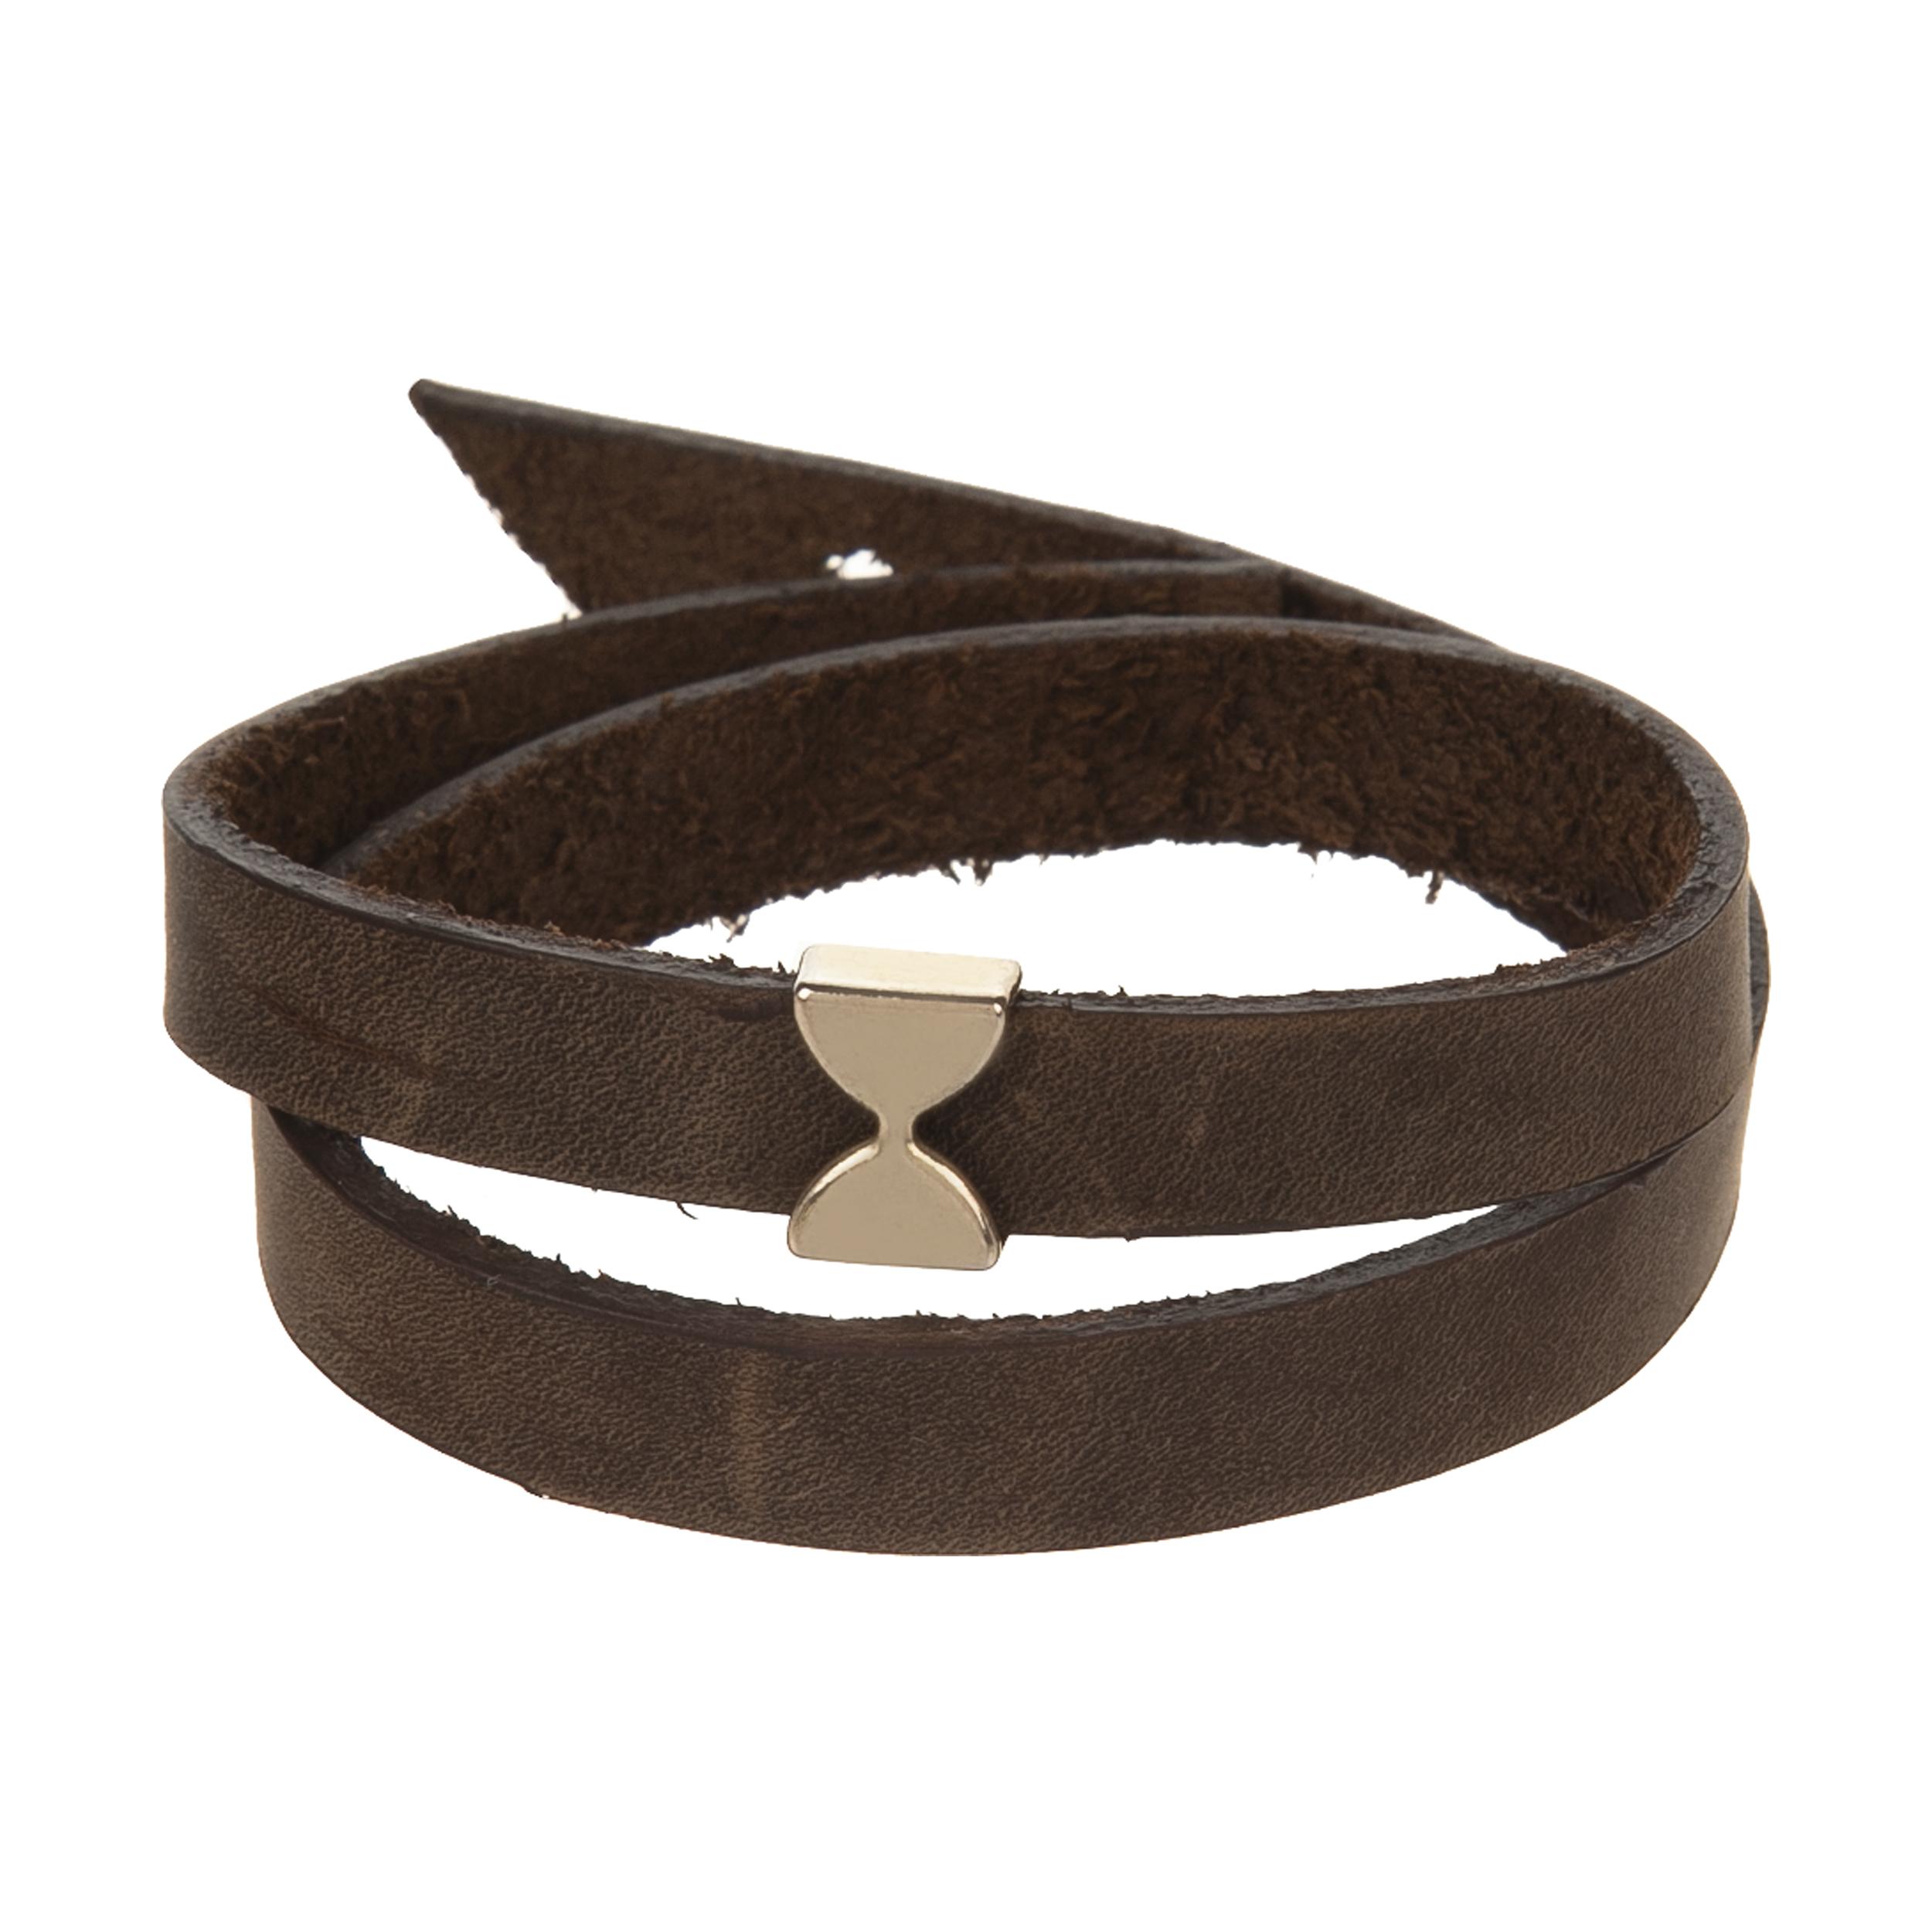 دستبند زنانه - چرم لانکا